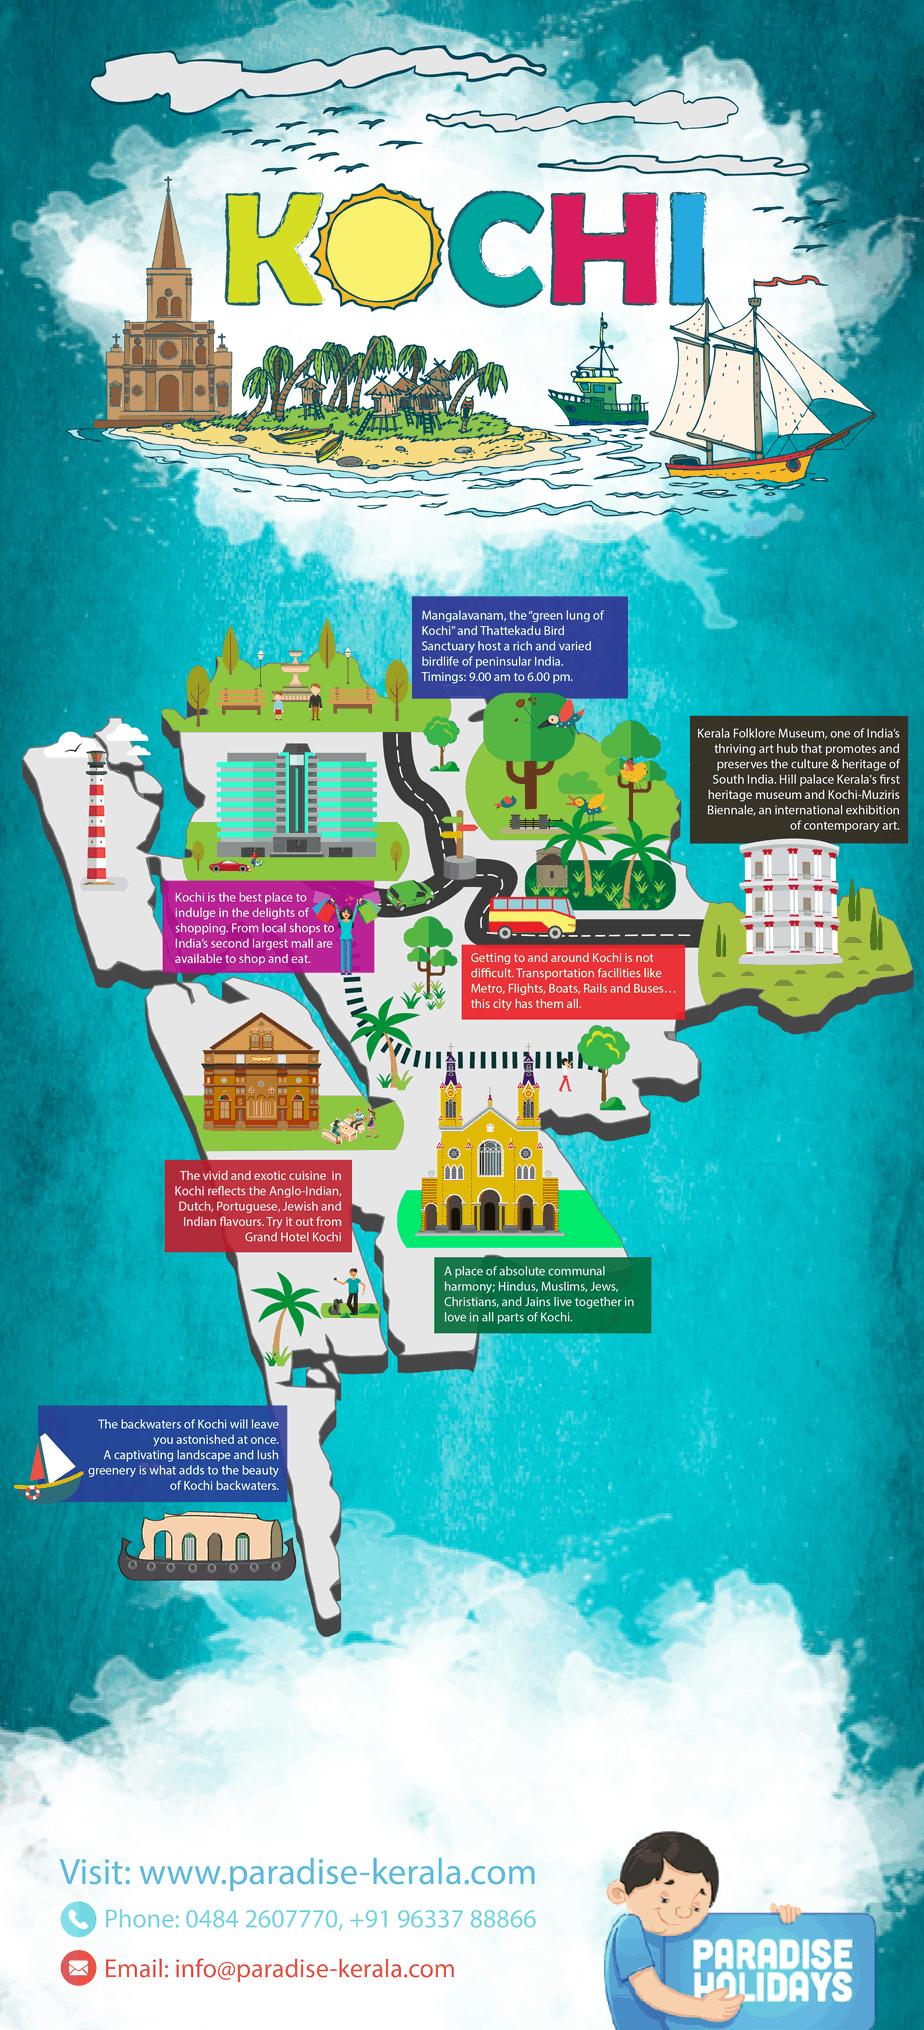 Kochi: the Ultimate Tourist Destination For a Memorable Trip